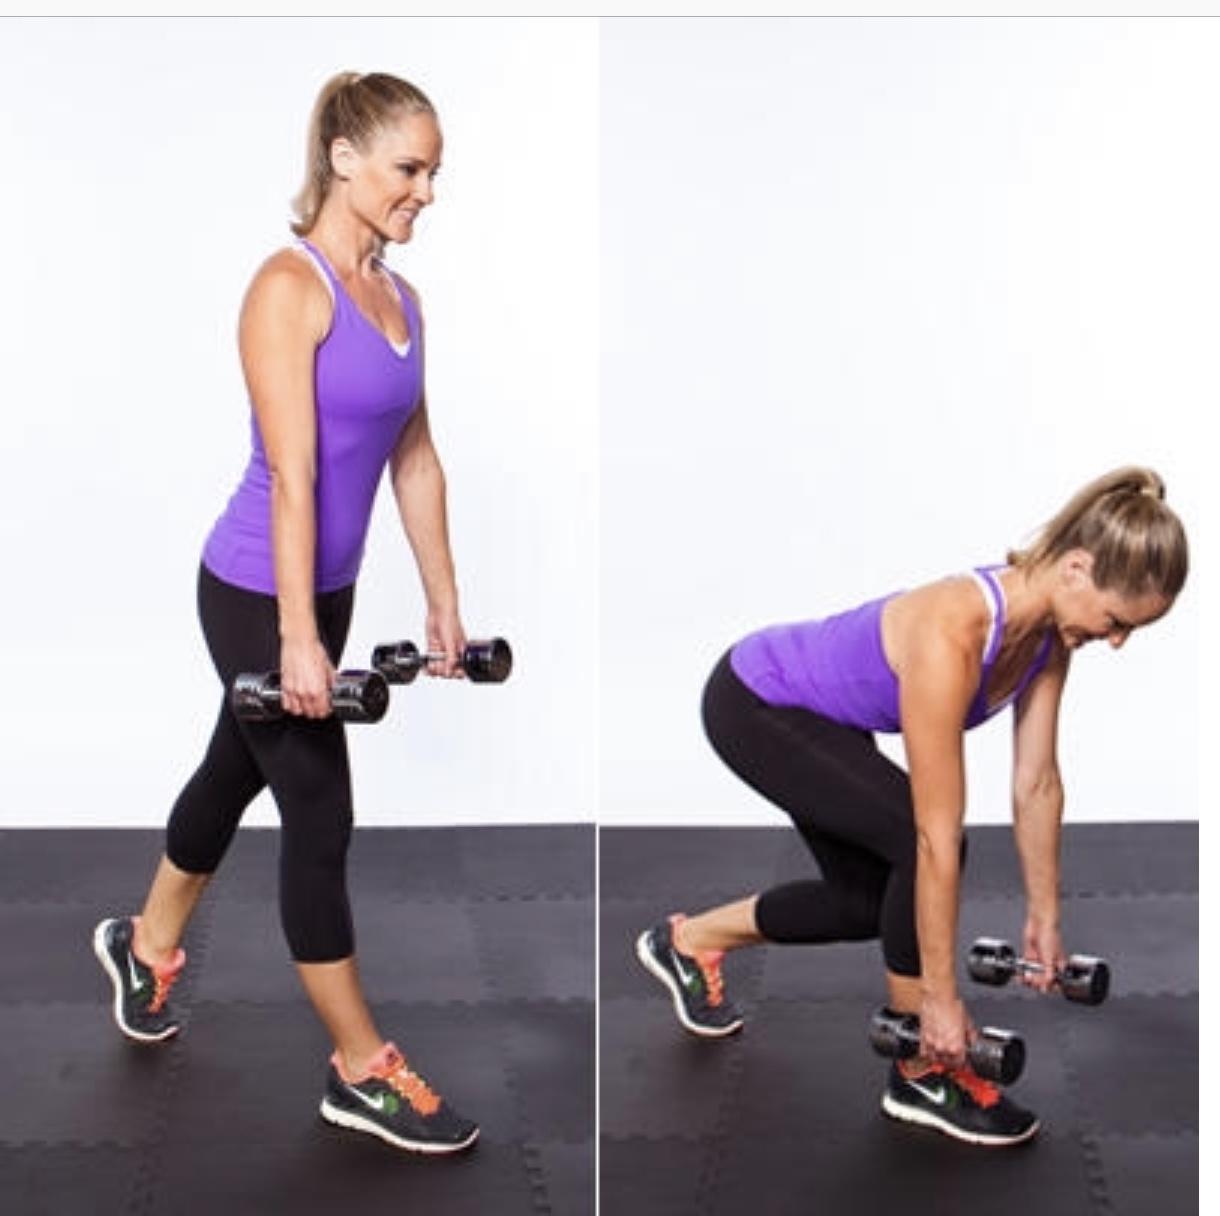 Move # 4: DB Alternating Step-ups